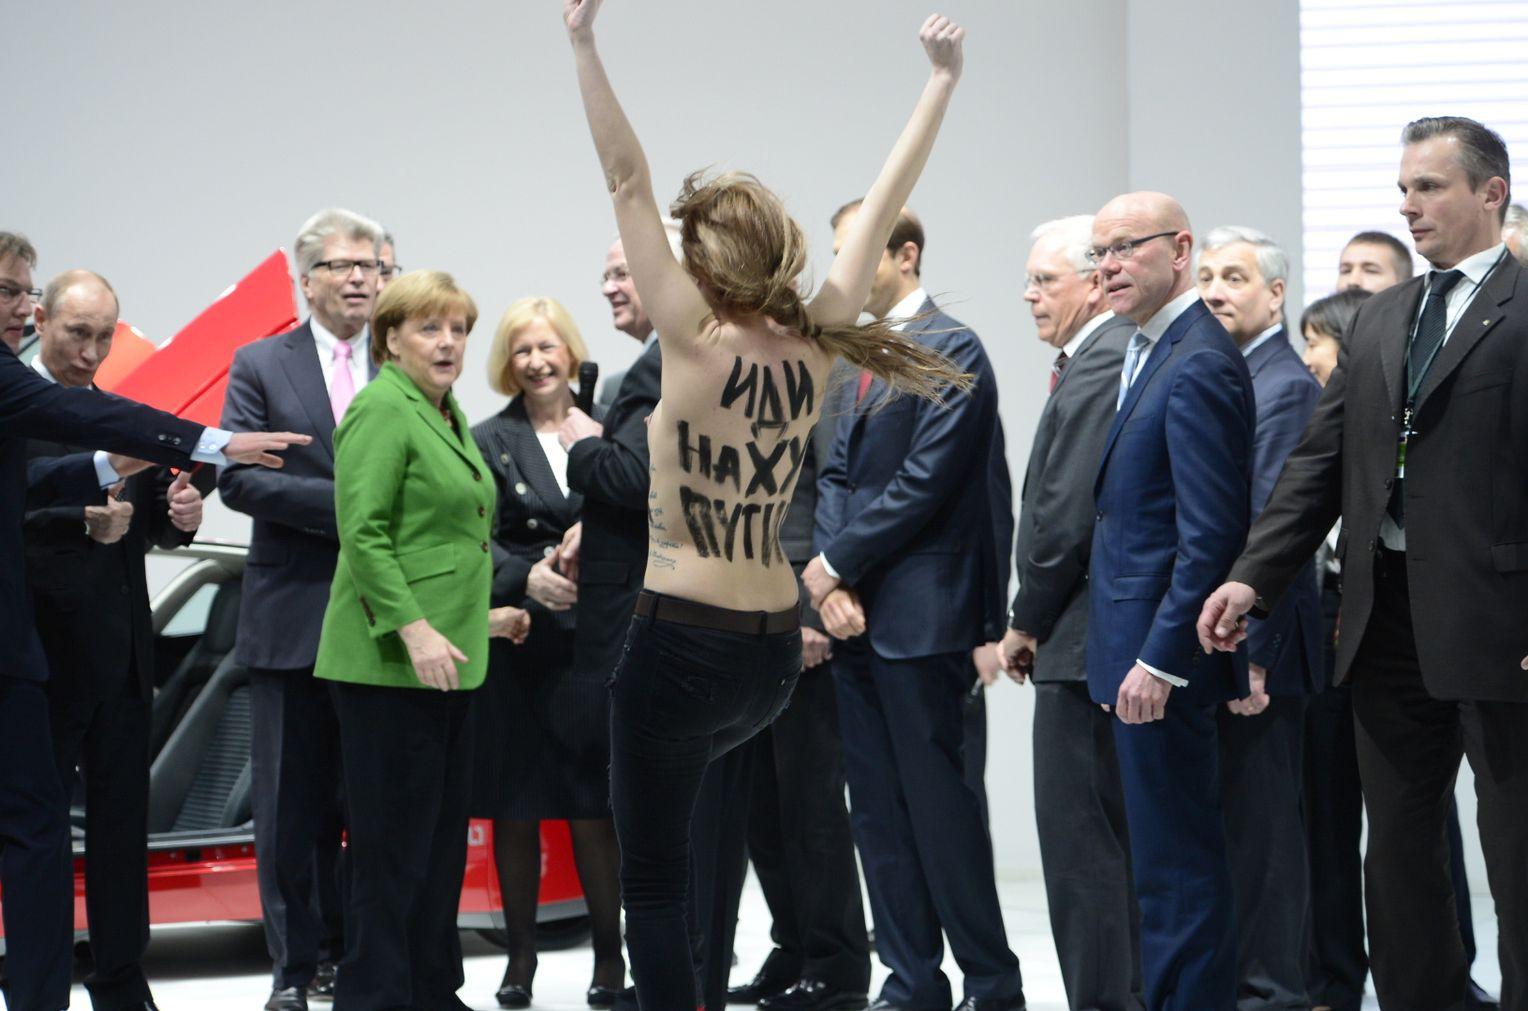 Angela Merkel Topless putin visibly amusedtopless femen protest in germany